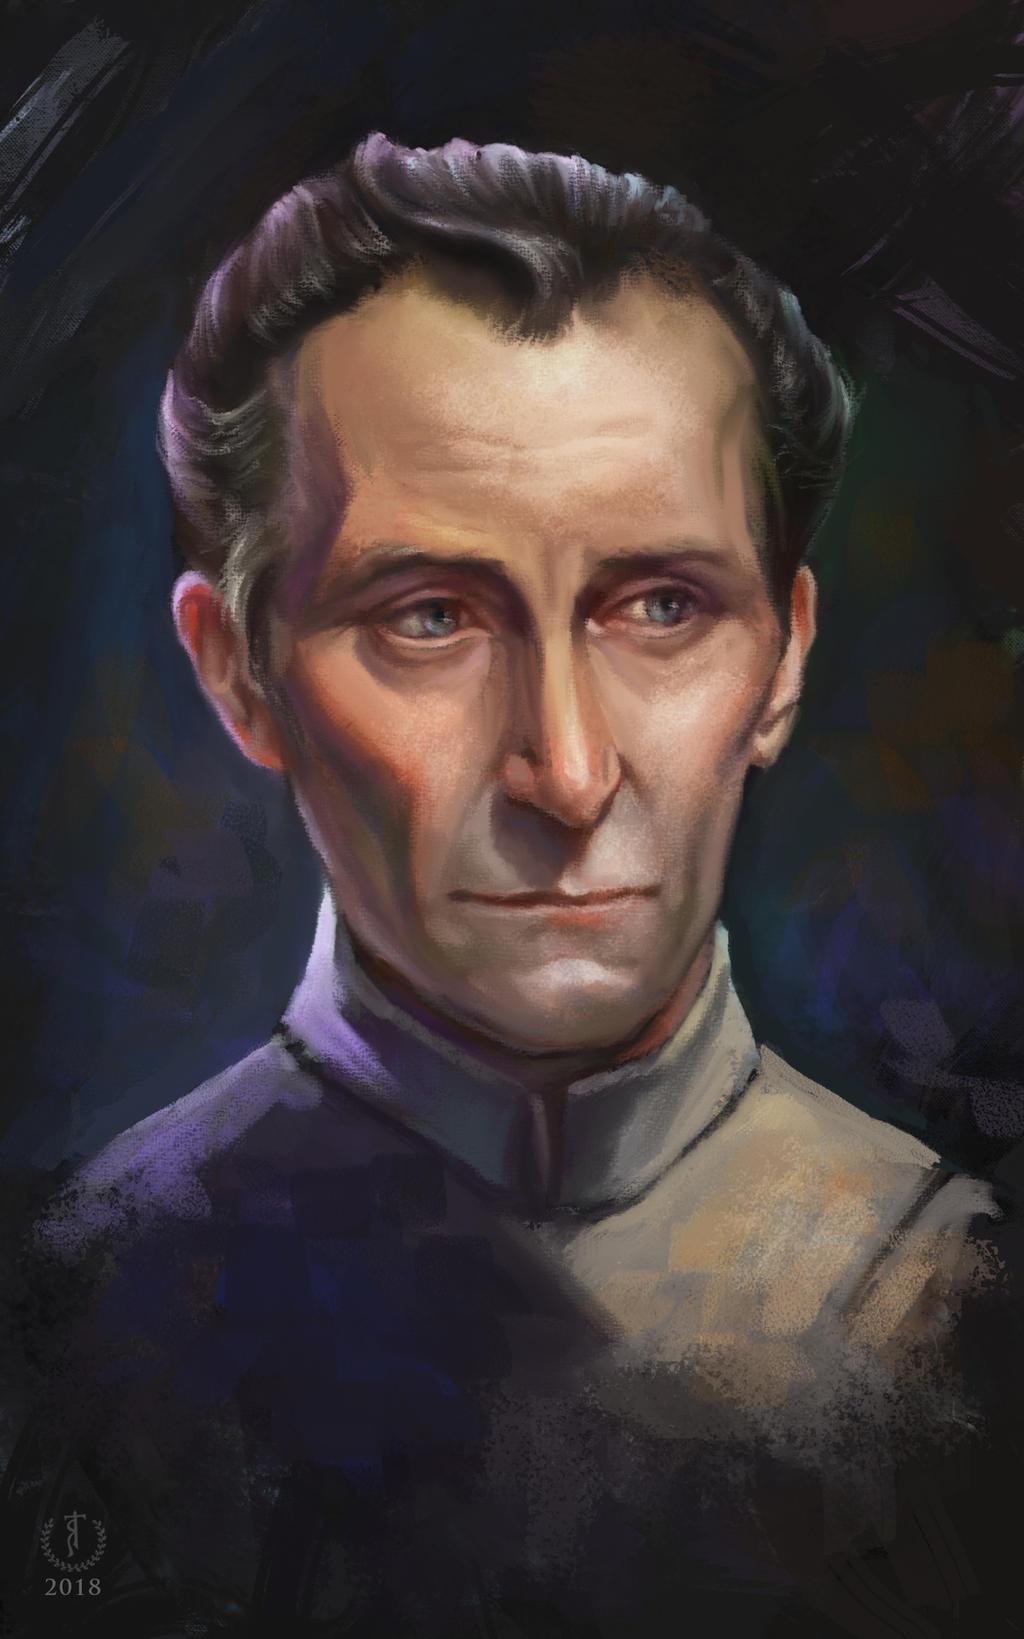 Tarkin/Peter Cushing   Star Wars portrait study